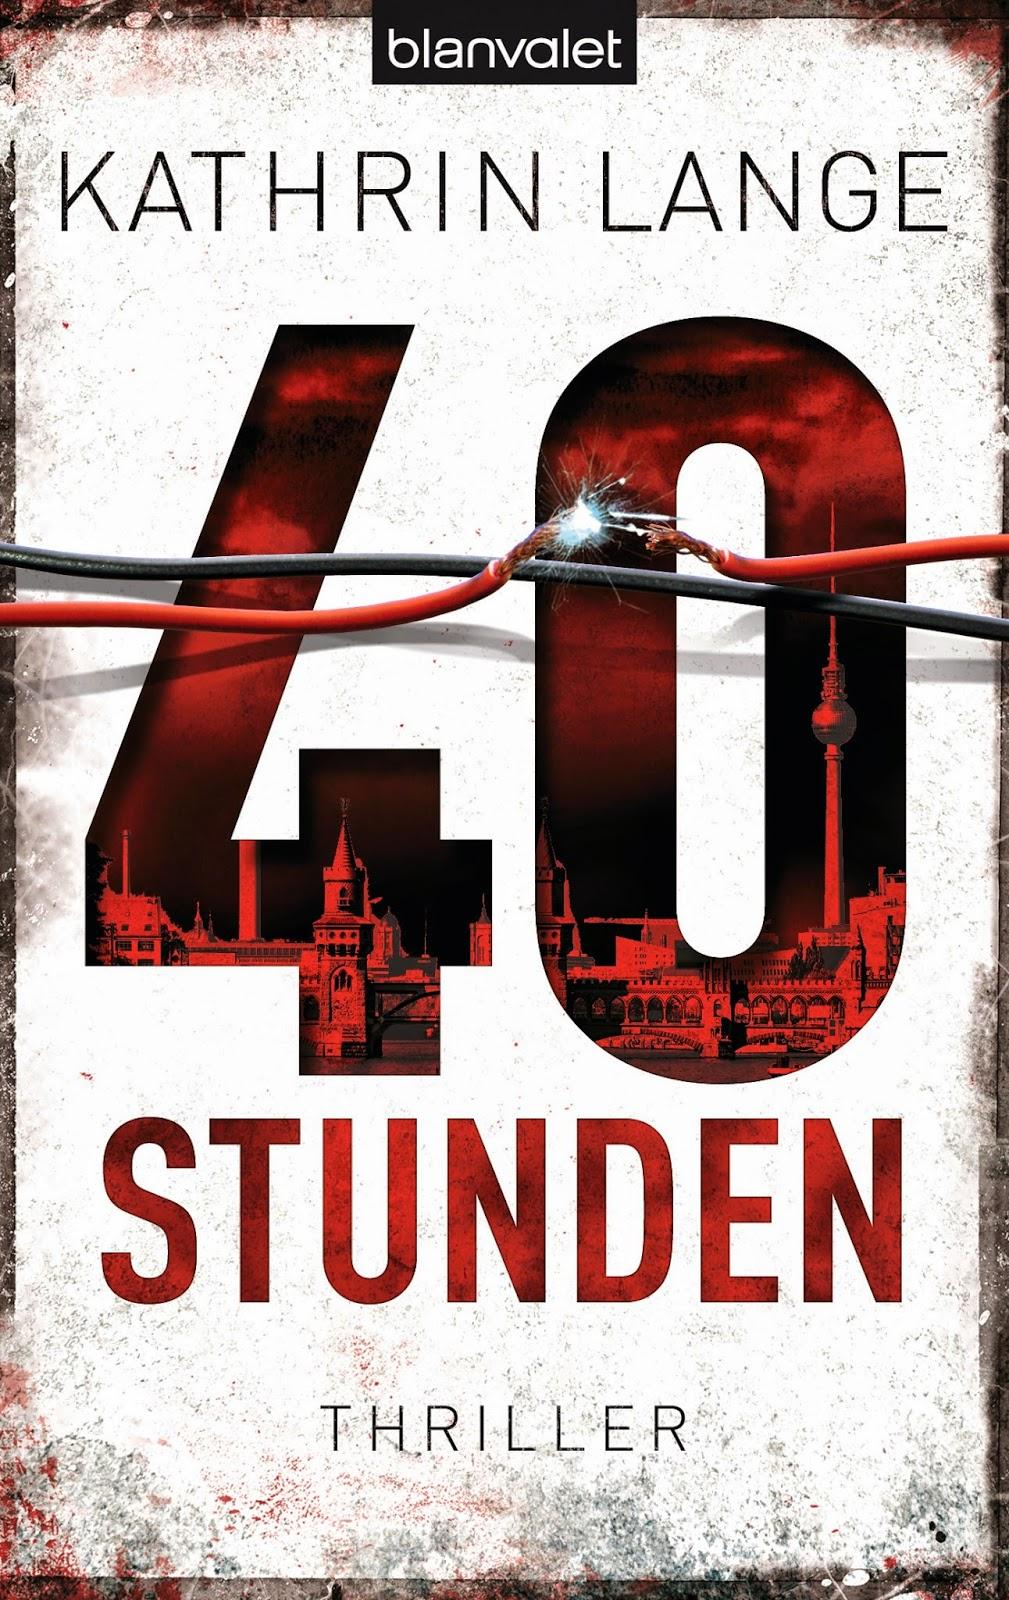 https://www.buchhaus-sternverlag.de/shop/action/productDetails/20604452/kathrin_lange_40_stunden_3442381290.html?aUrl=90007403&searchId=0&originalSearchString=